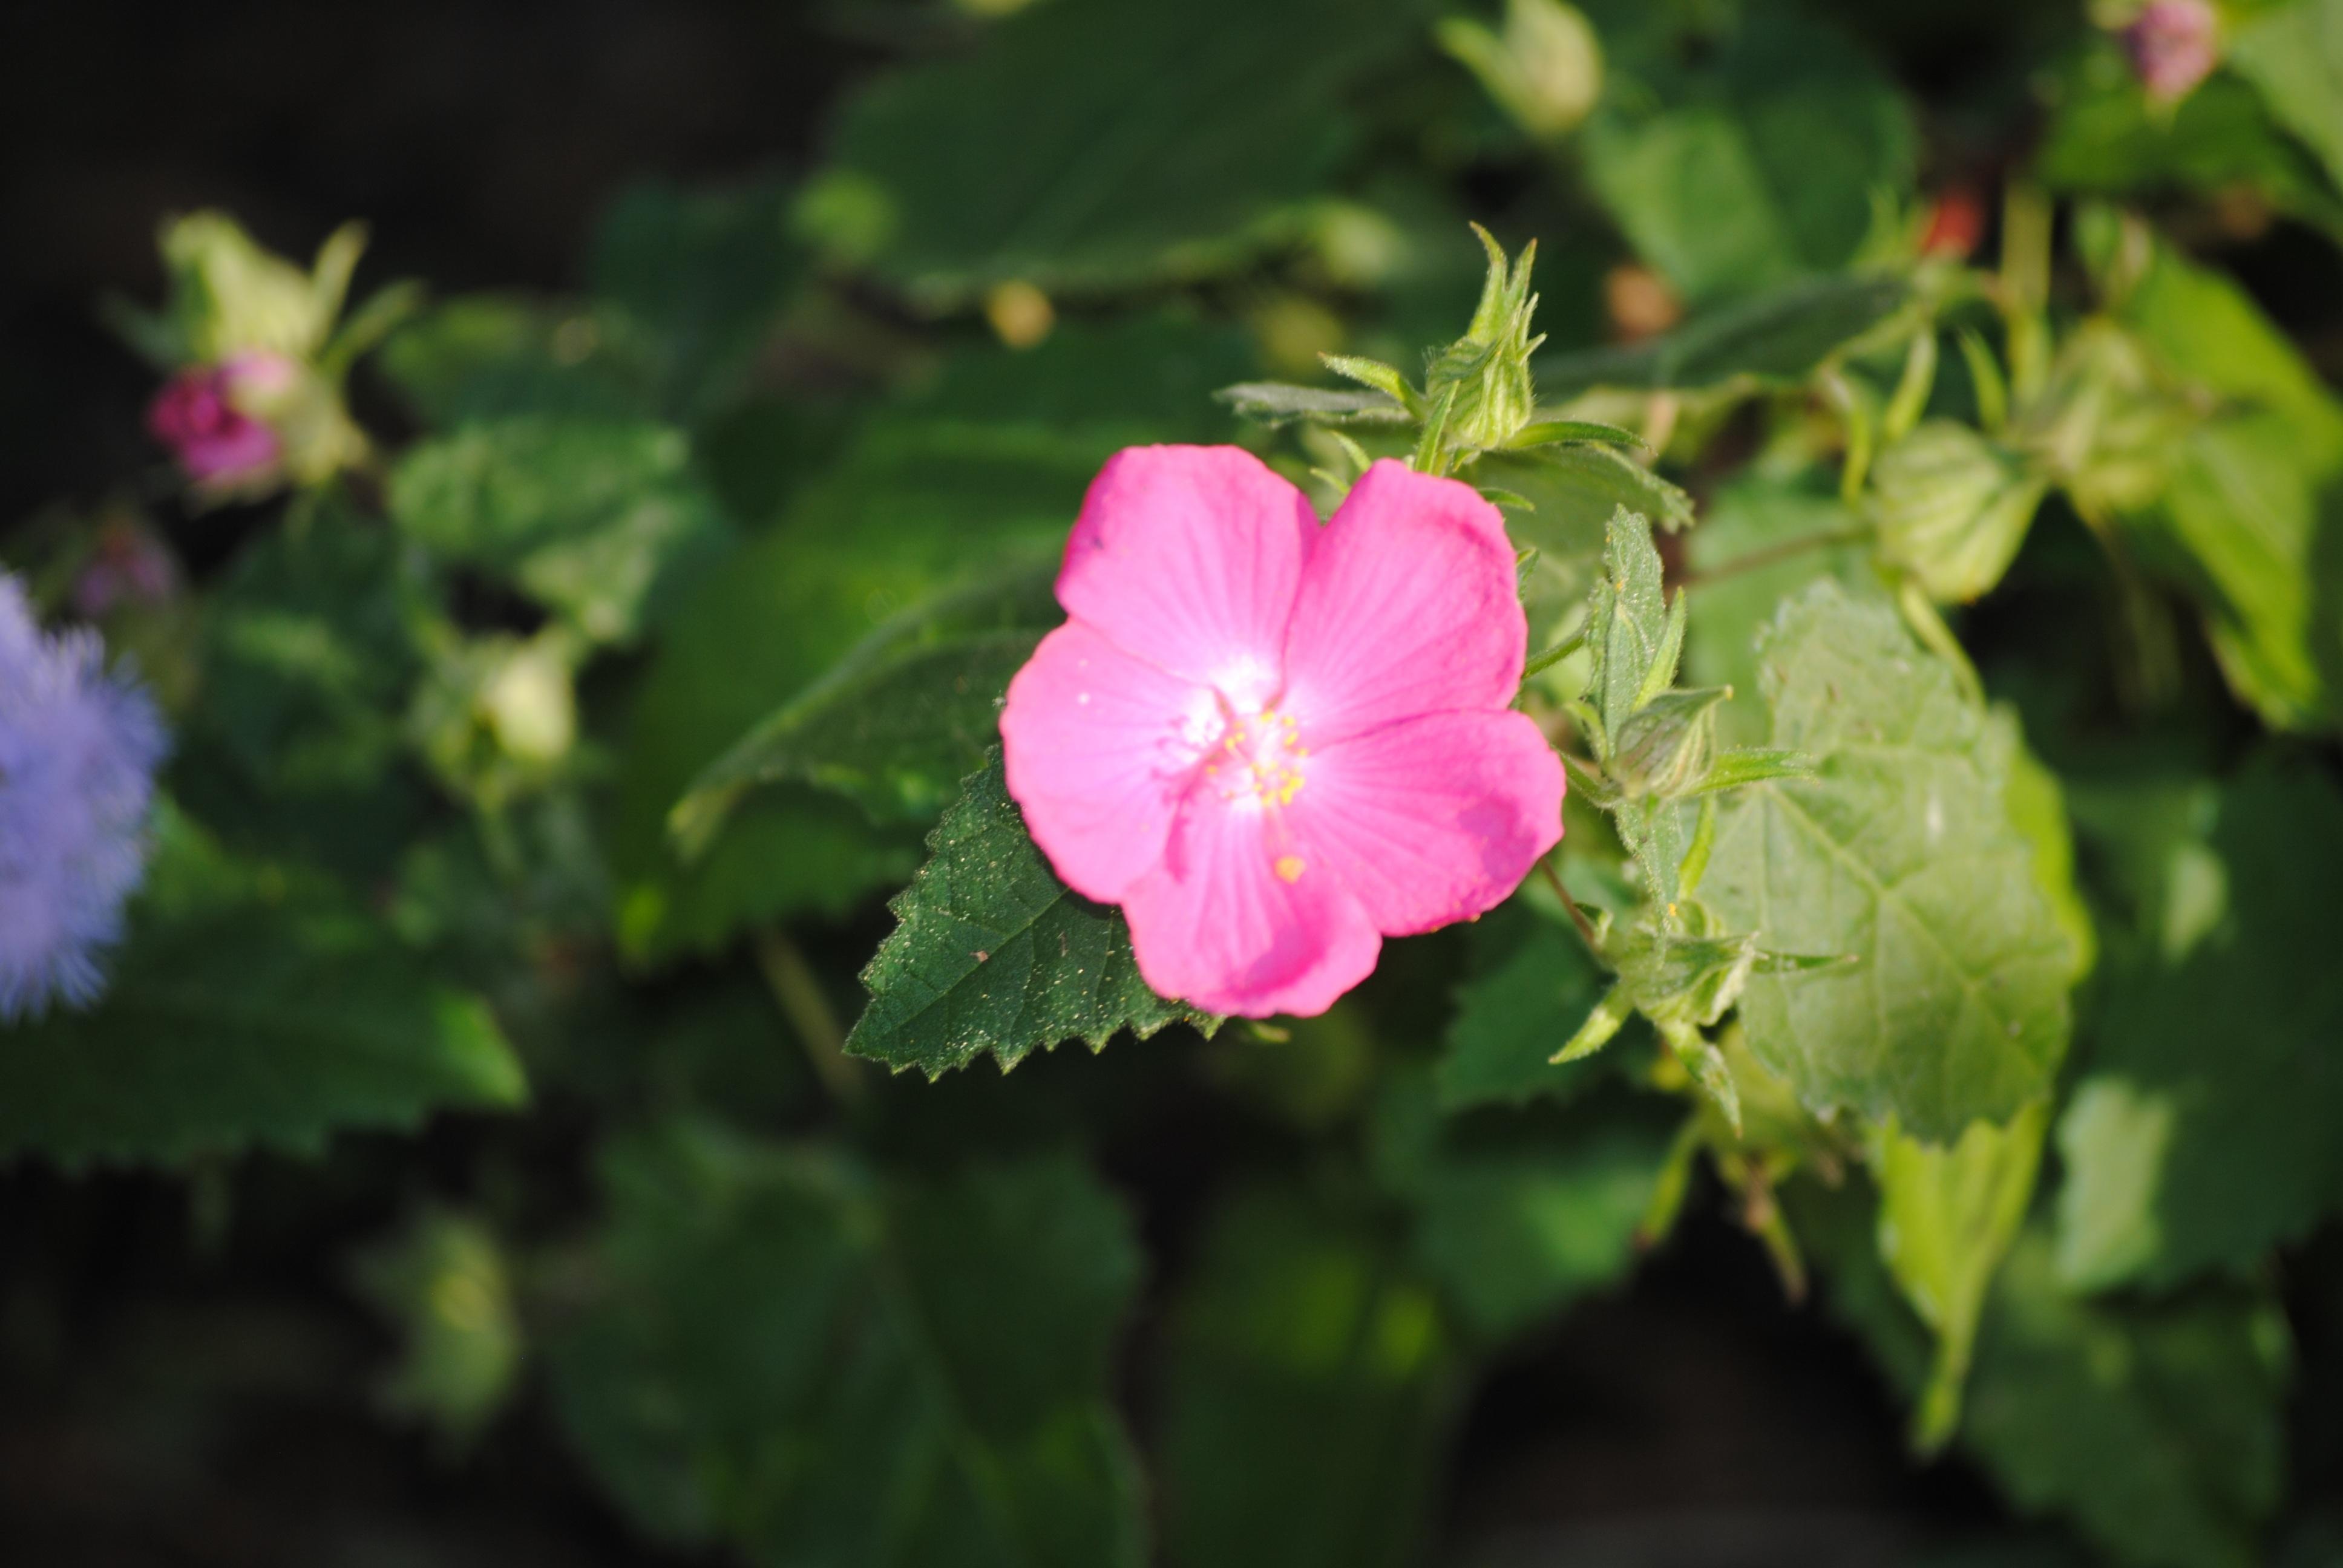 Fotos gratis : naturaleza, blanco, hoja, púrpura, pétalo, florecer ...